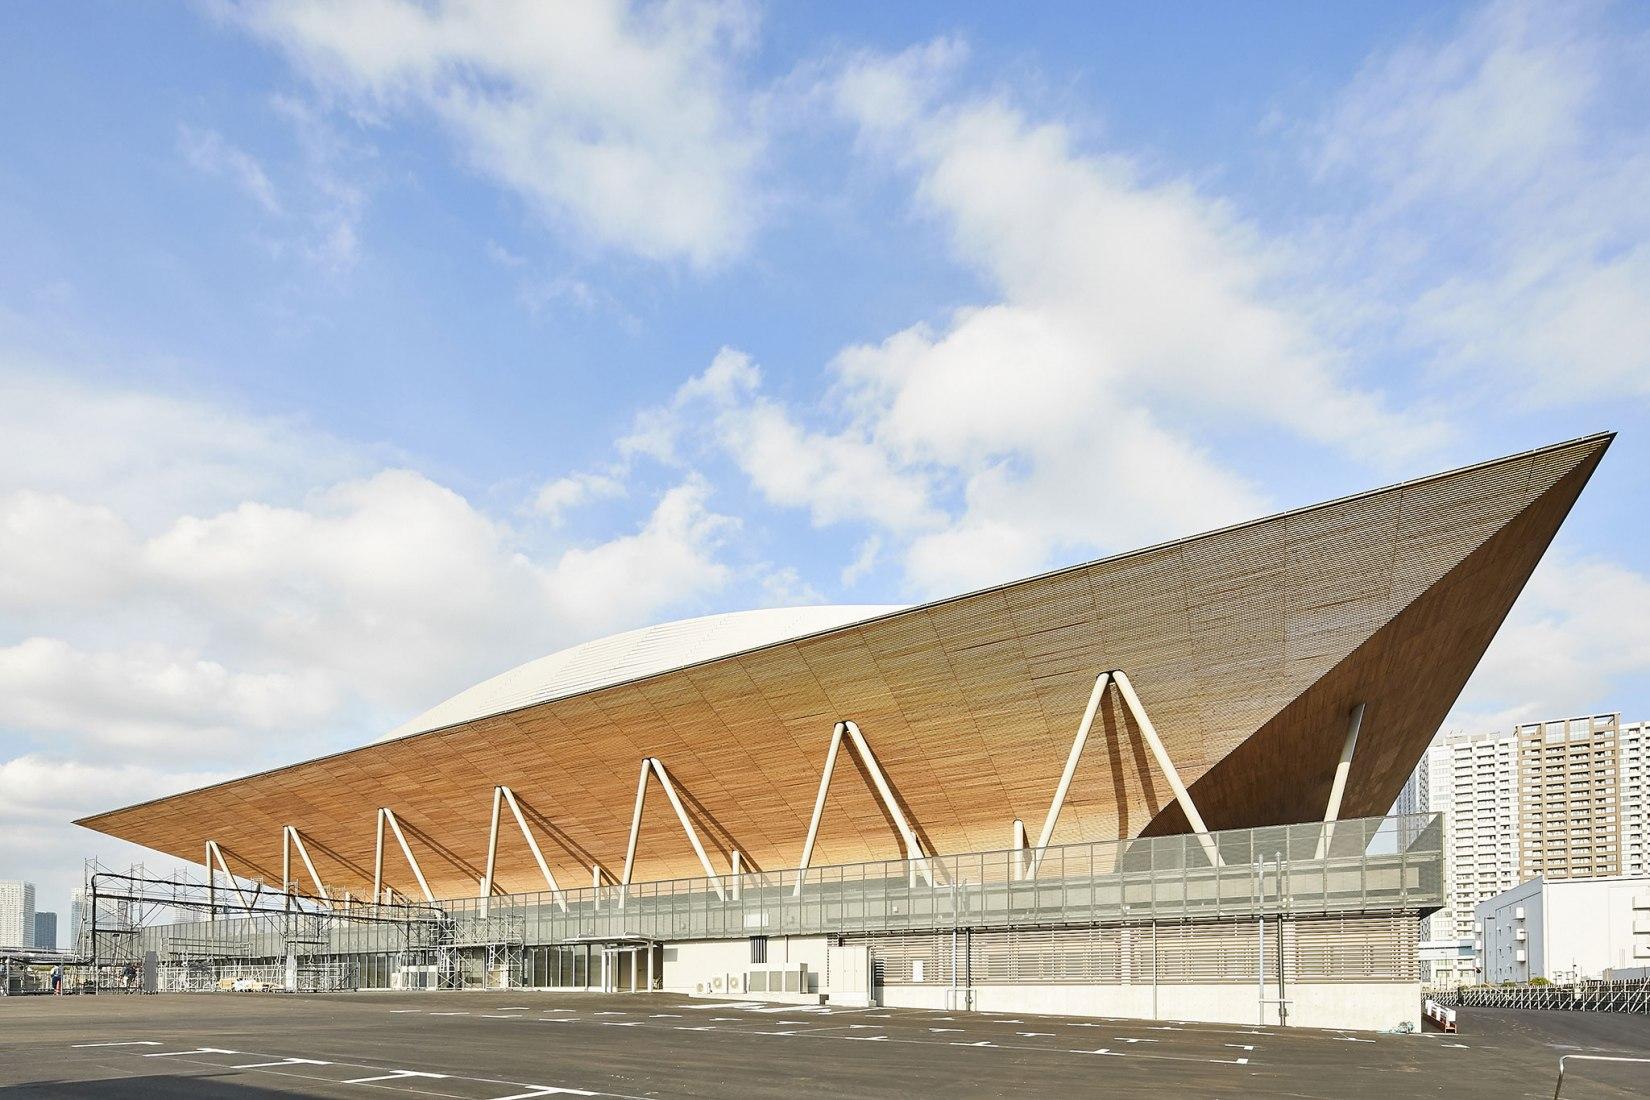 El Centro de Gimnasia de Ariake por Nikken Sekkei. Fotografía por SS Company Limited